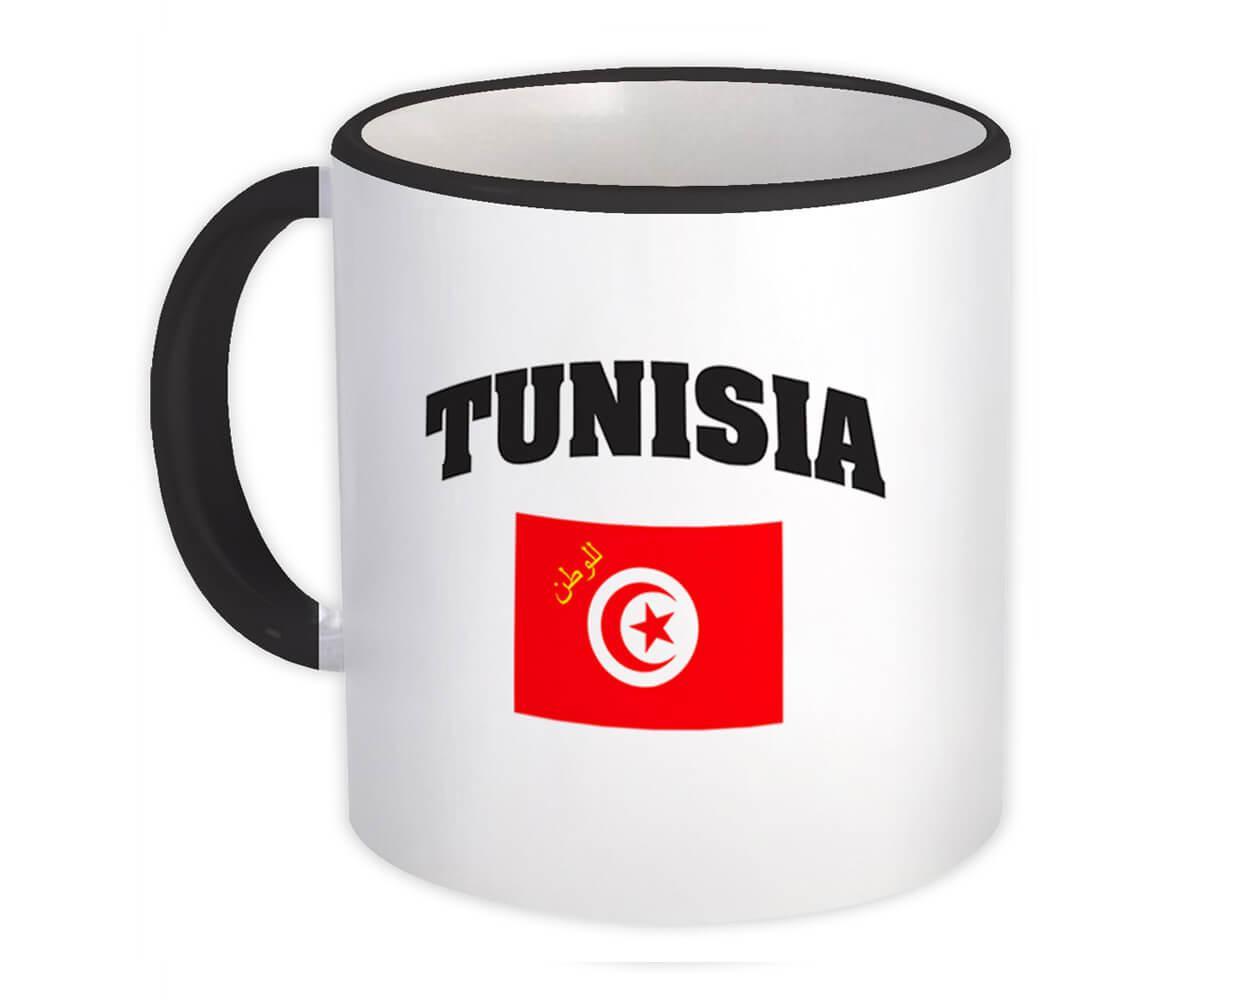 Tunisia : Gift Mug Flag Chest Tunisian Expat Country Patriotic Flags Travel Souvenir